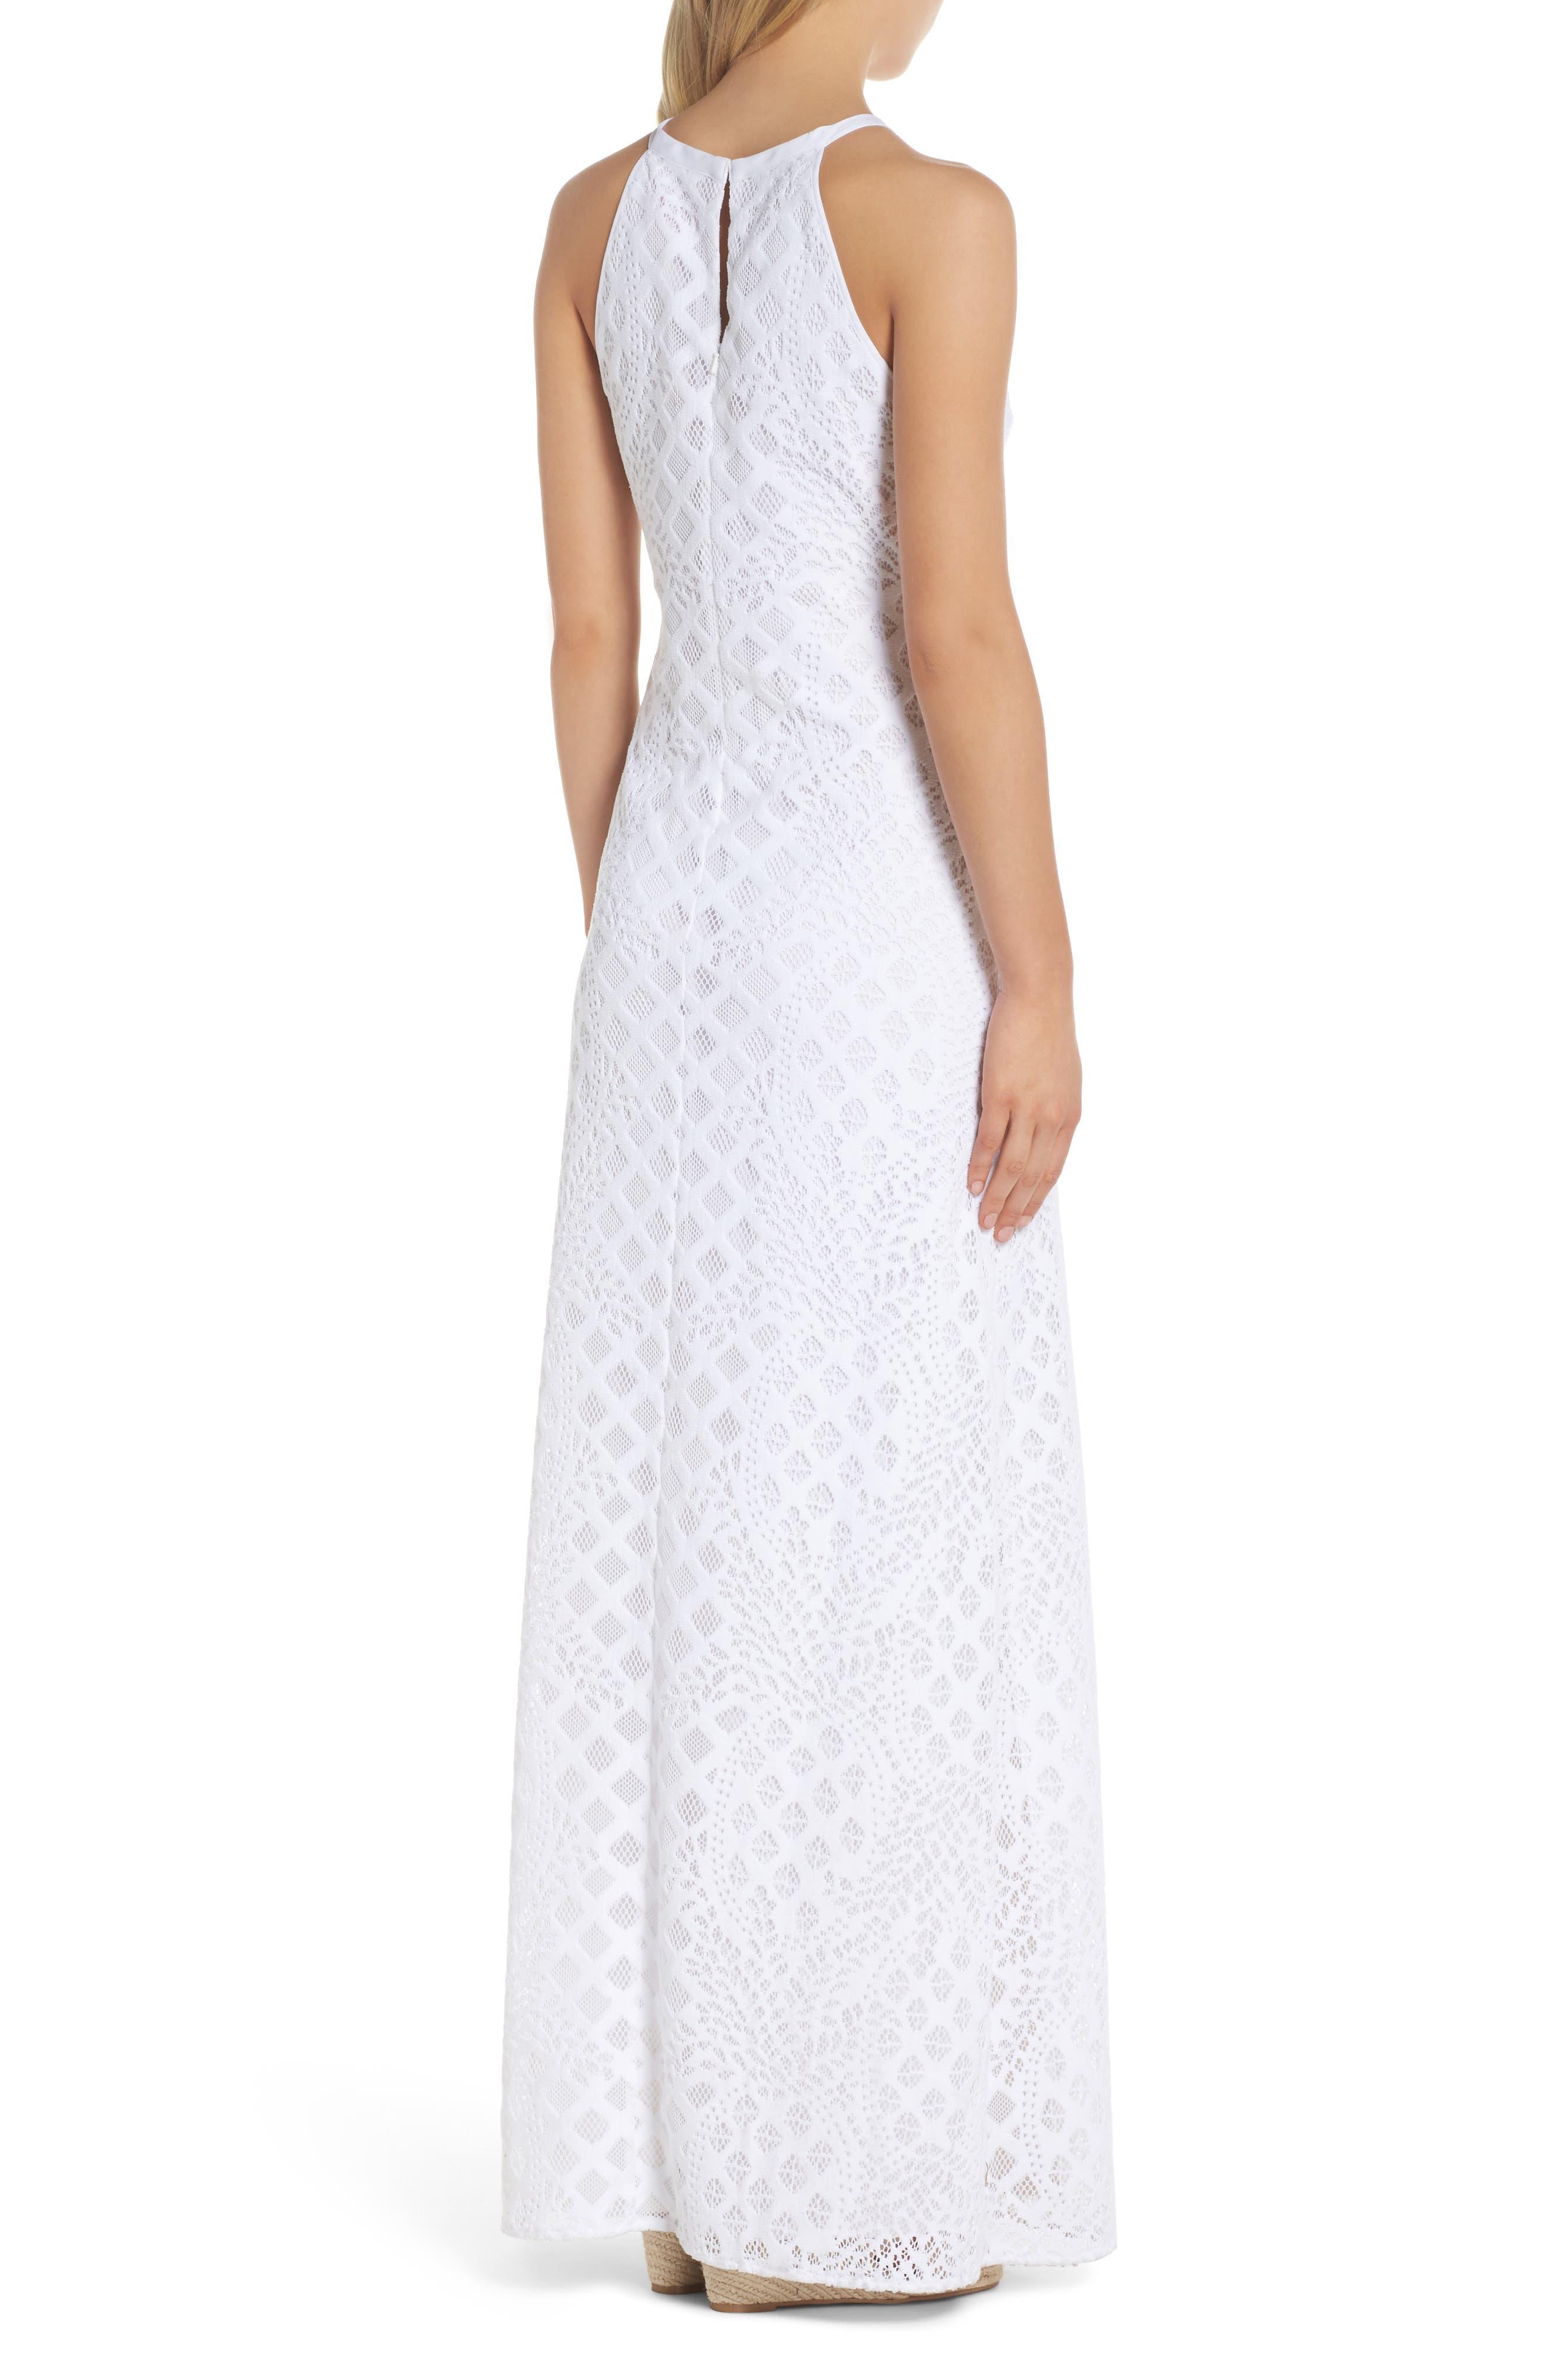 Pearl Maxi Dress,                             Alternate thumbnail 2, color,                             Resort White Pineapple Lace